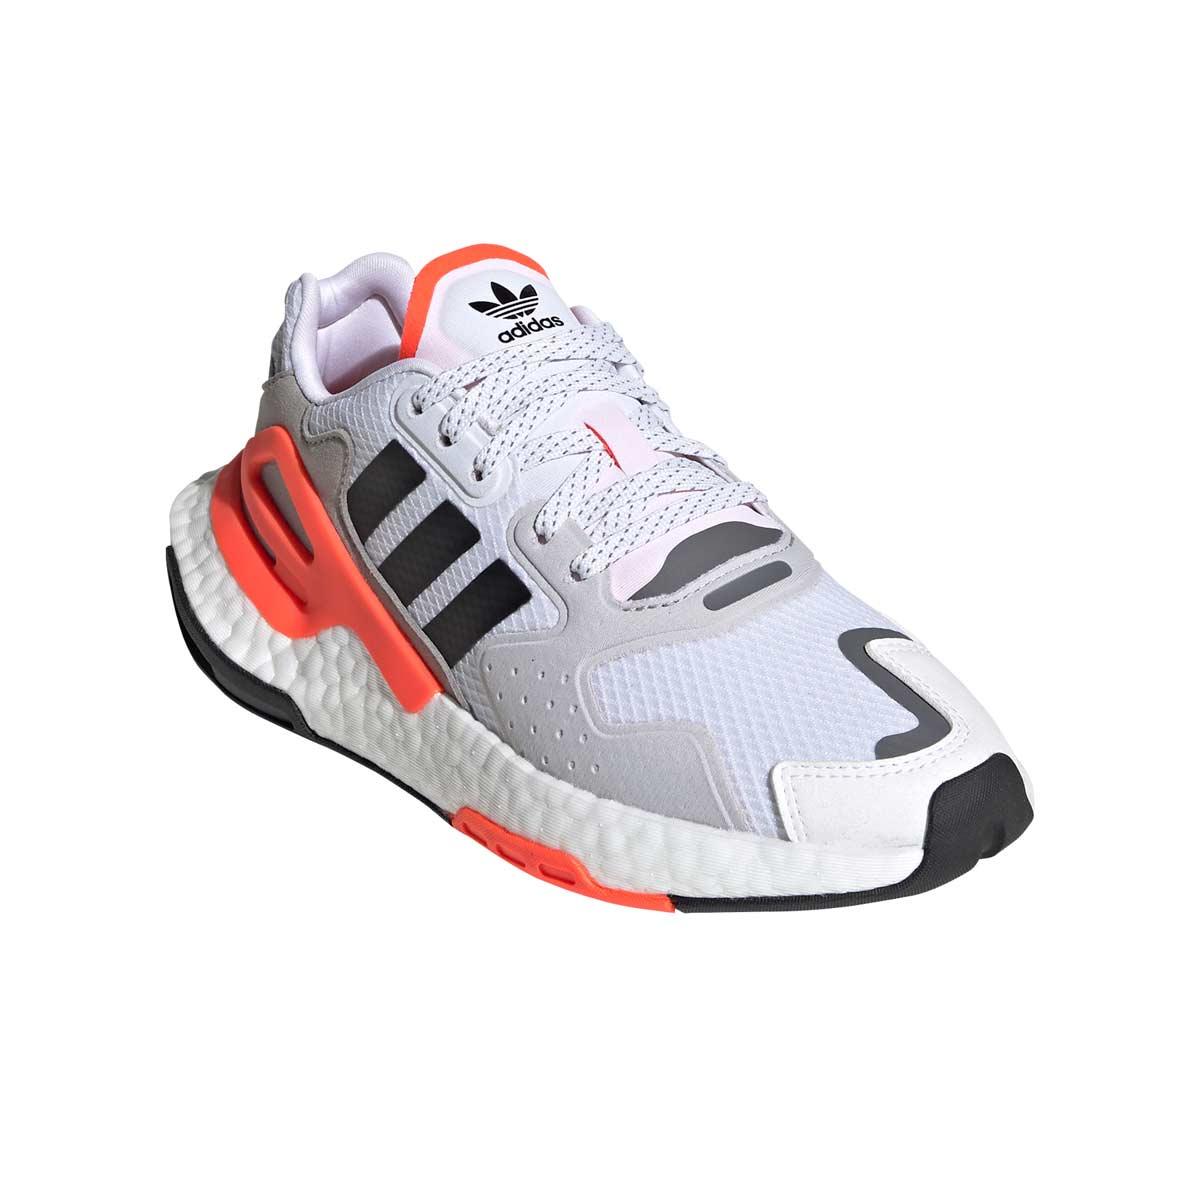 Tenis-Adidas-Day-Jogger-J--33-ao-37-FW5229--4Q20-